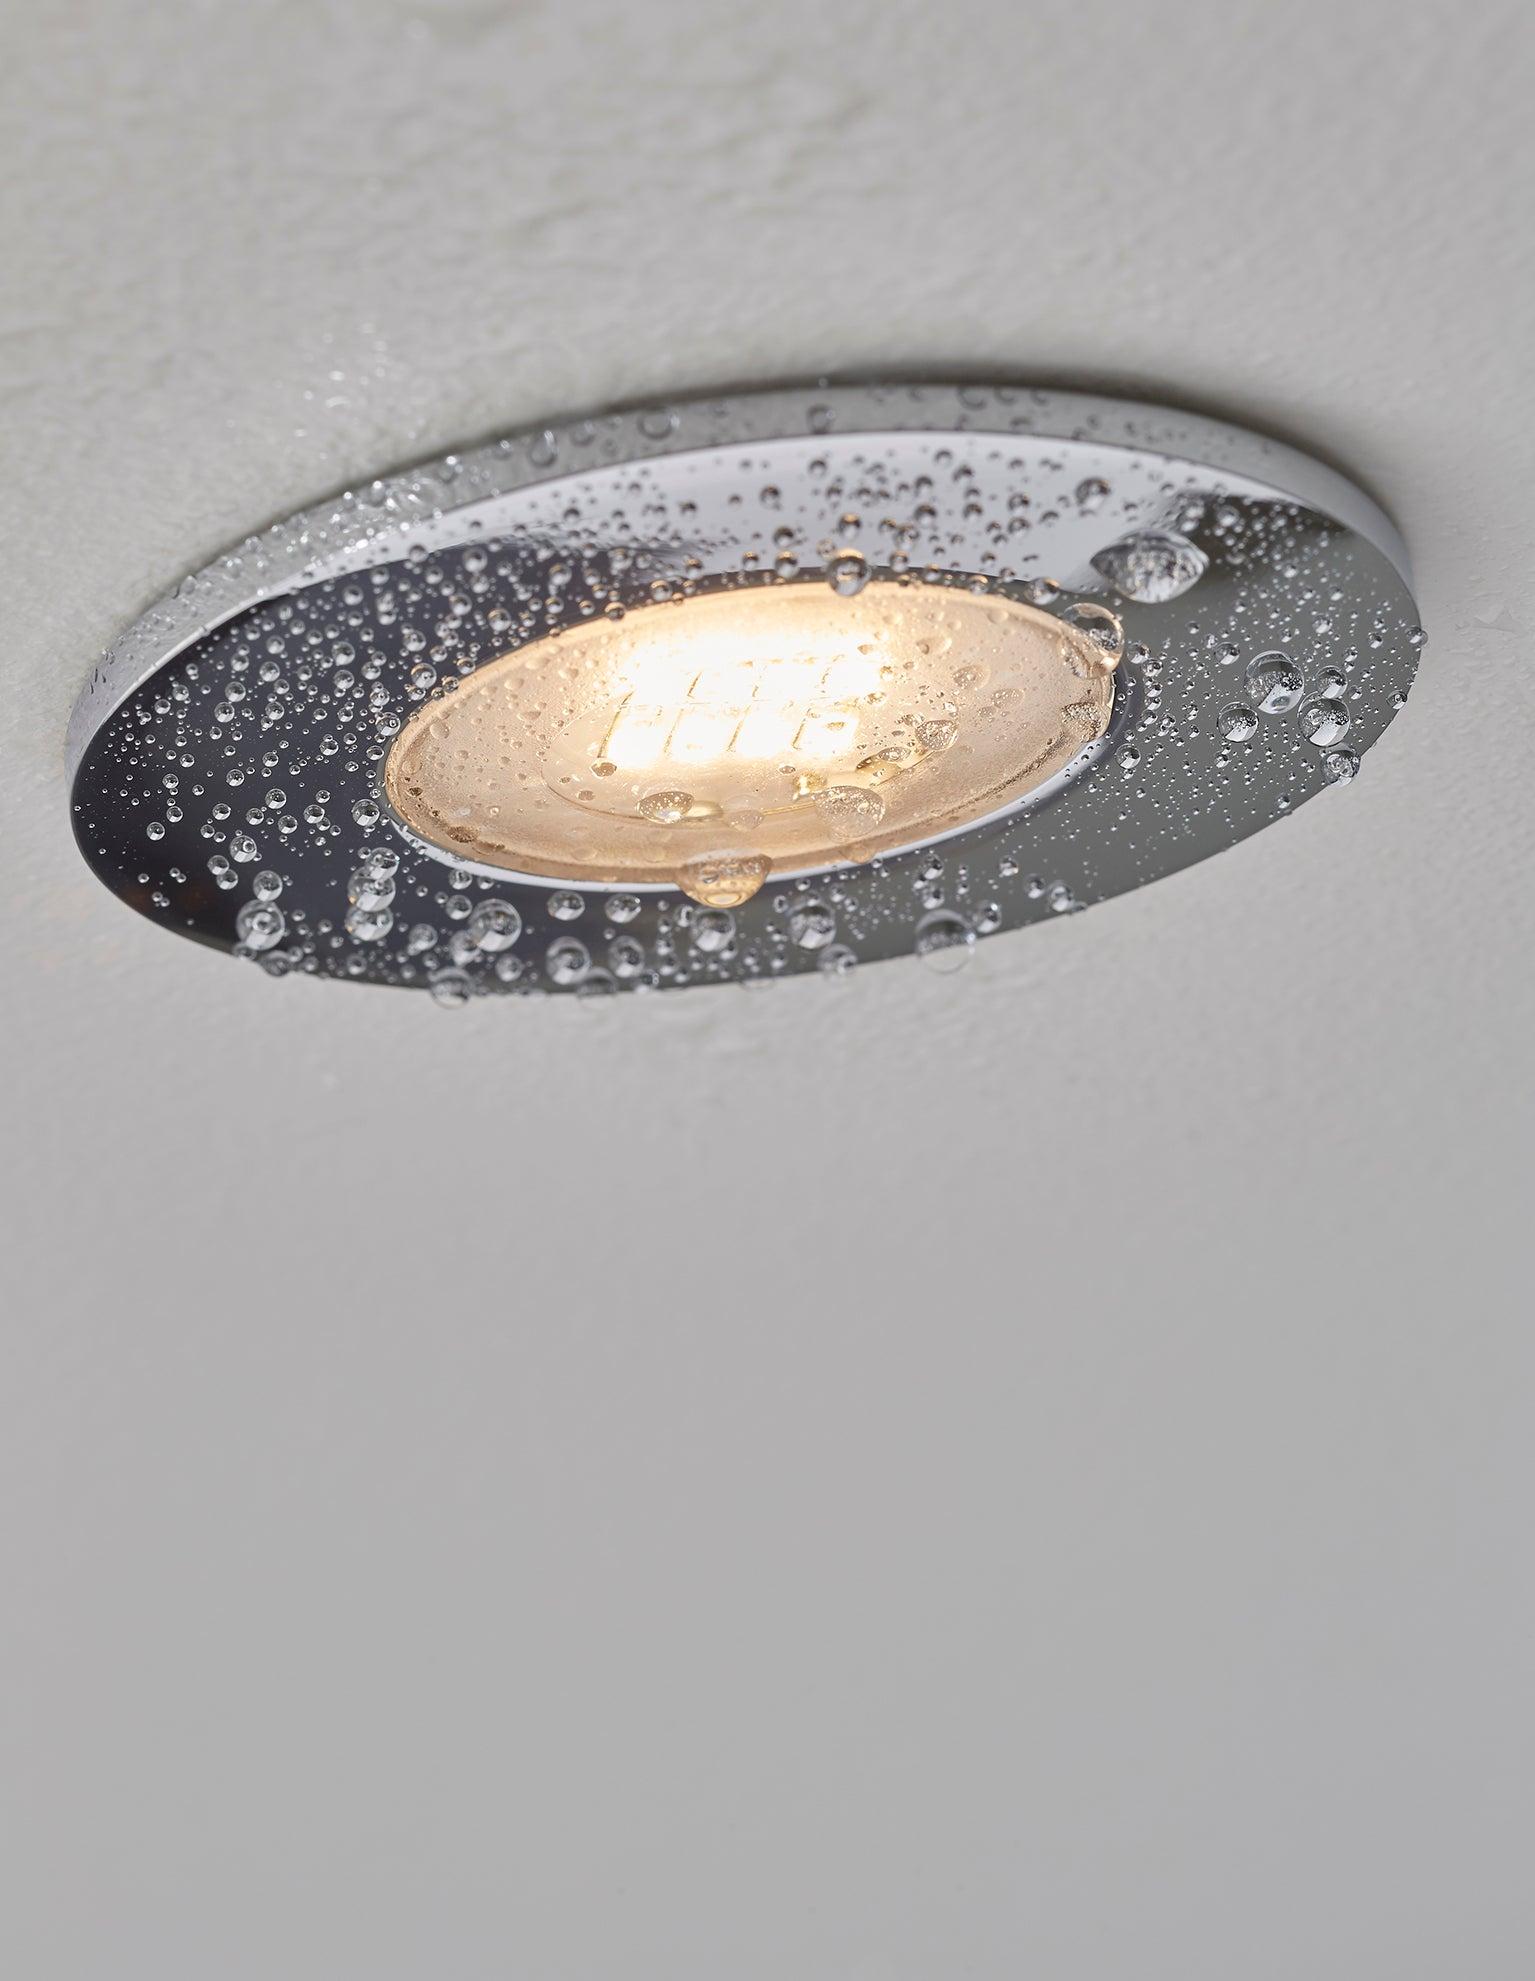 Kit 3 Spots A Encastrer Salle De Bains Kilia Fixe Inspire Led Integree Chrome Leroy Merlin